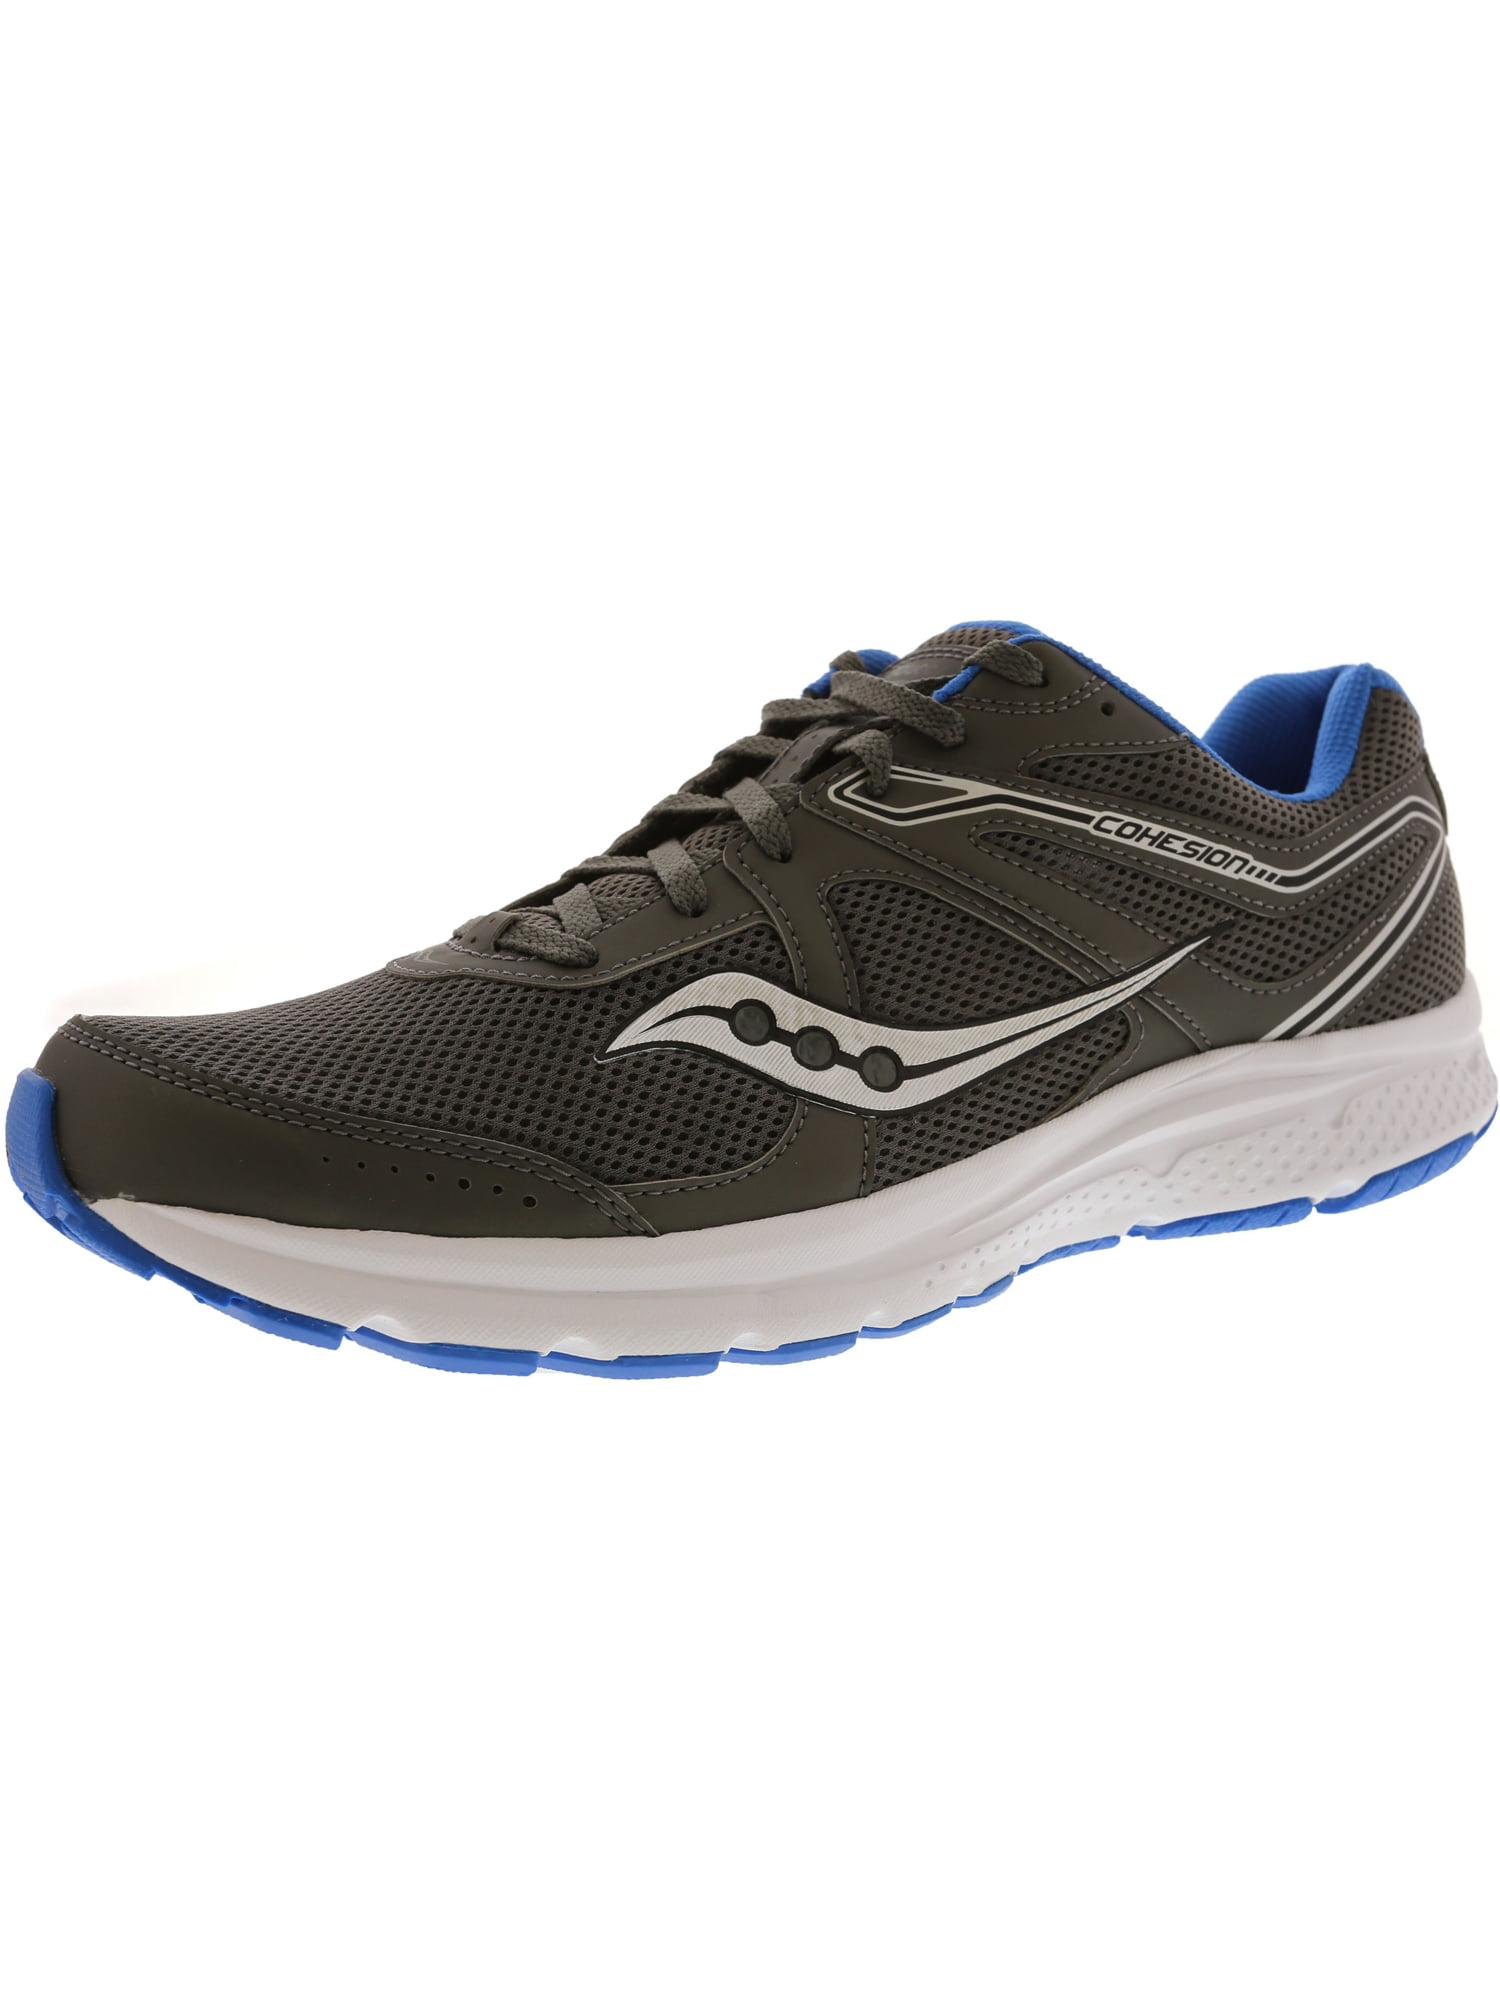 Saucony Men's Grid Cohesion 11 Gunmetal Black Ankle High Mesh Running Shoe 11.5M